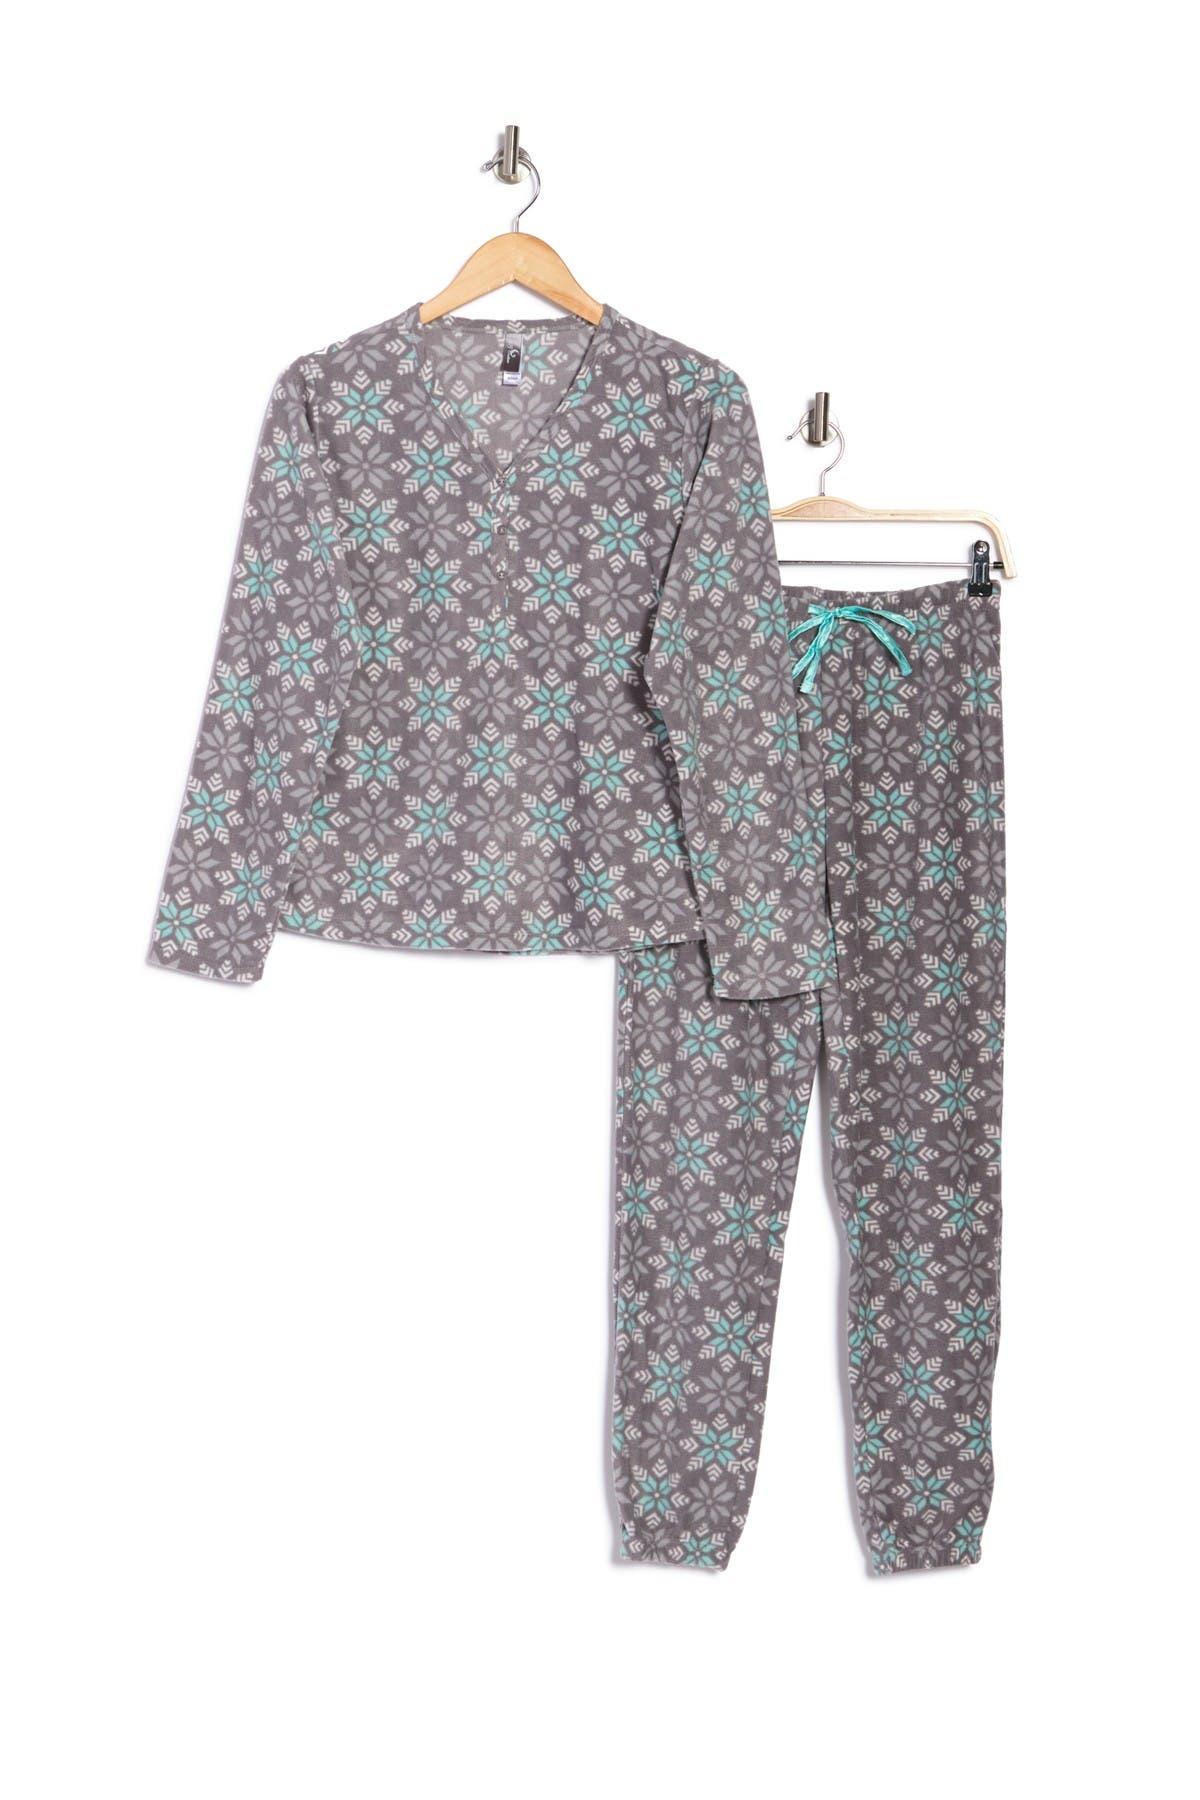 PJ Couture Printed Shirt & Pants 2-Piece Pajama Set